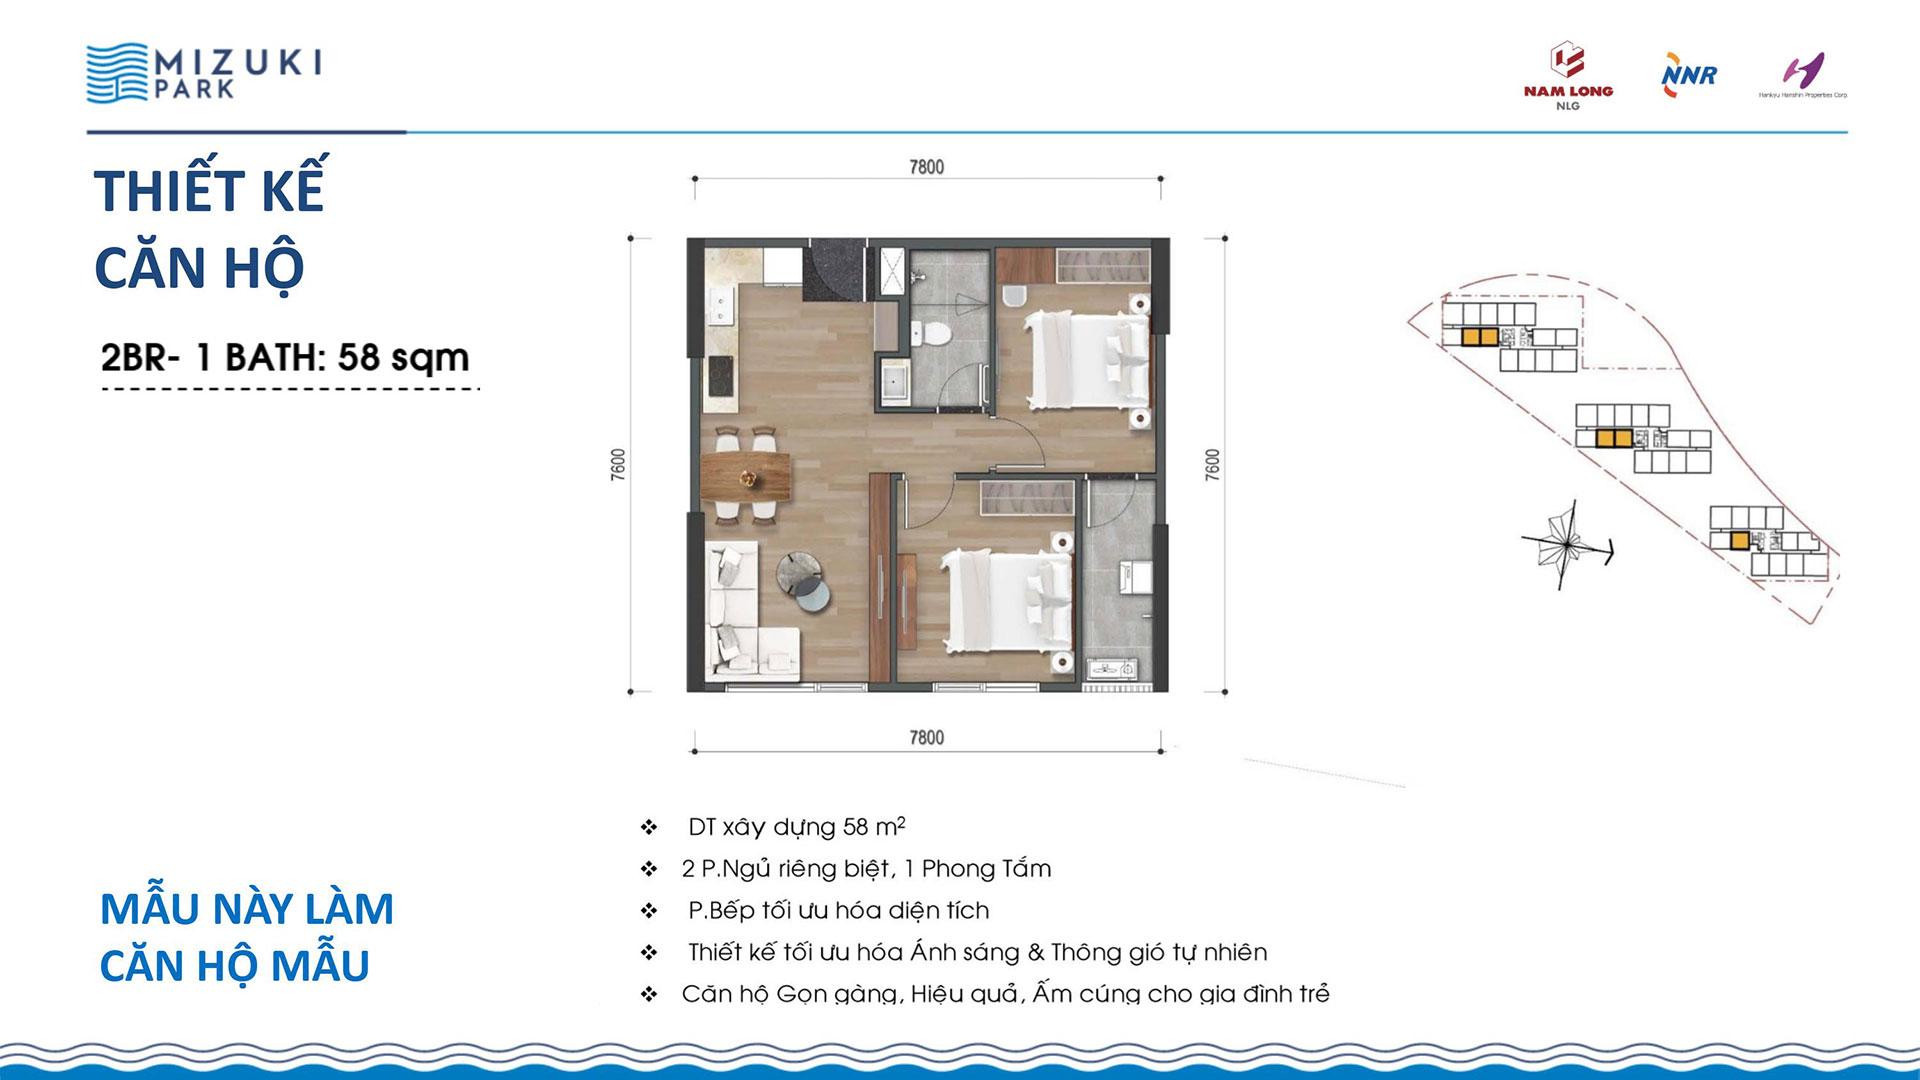 Thiết kế căn hộ Mizuki Park 58m2